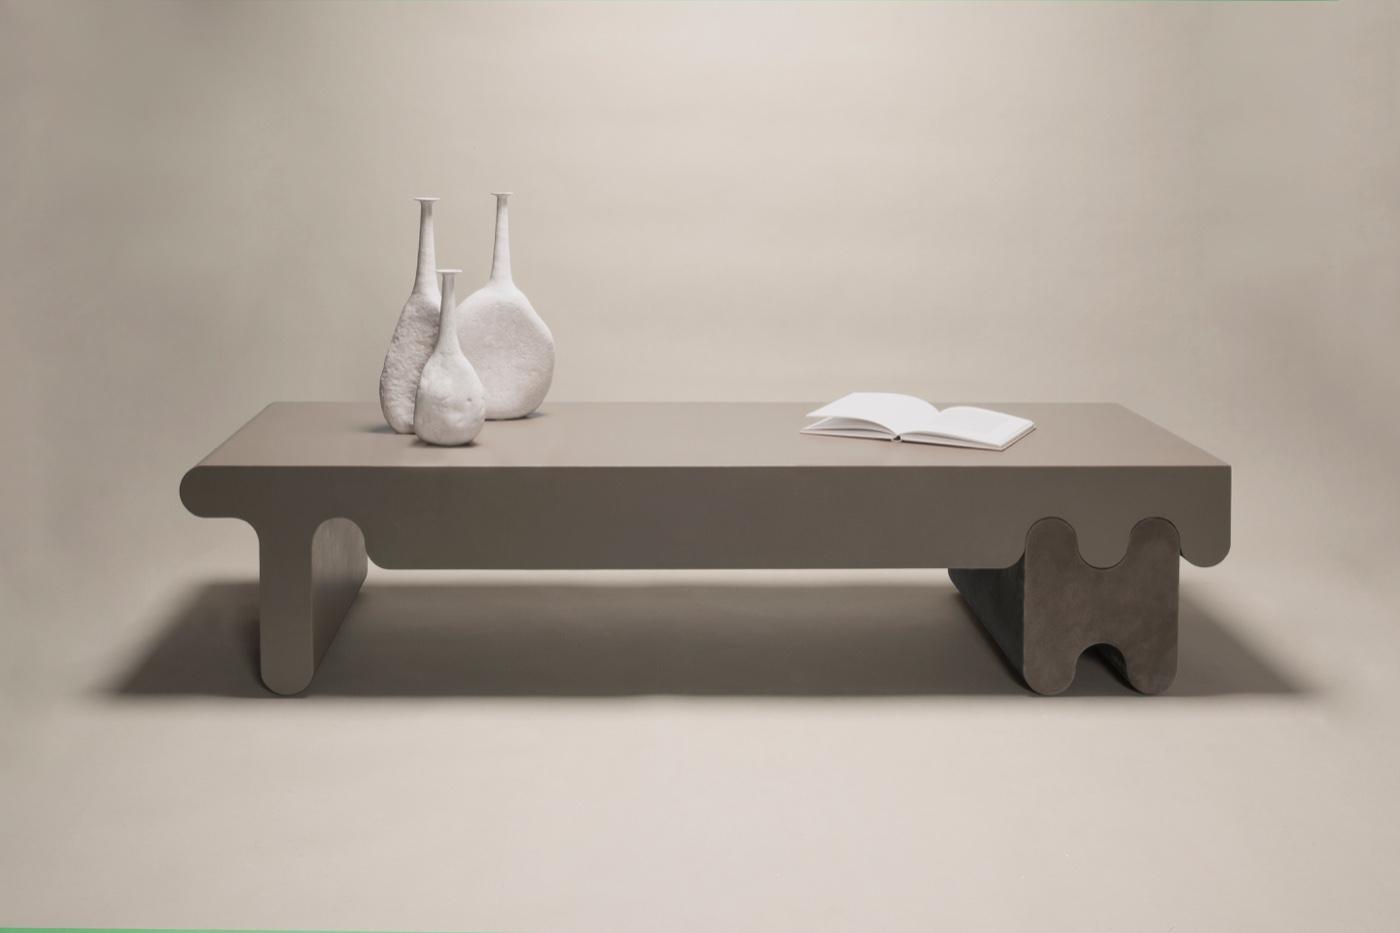 Sculpturale Meubels-Image-3